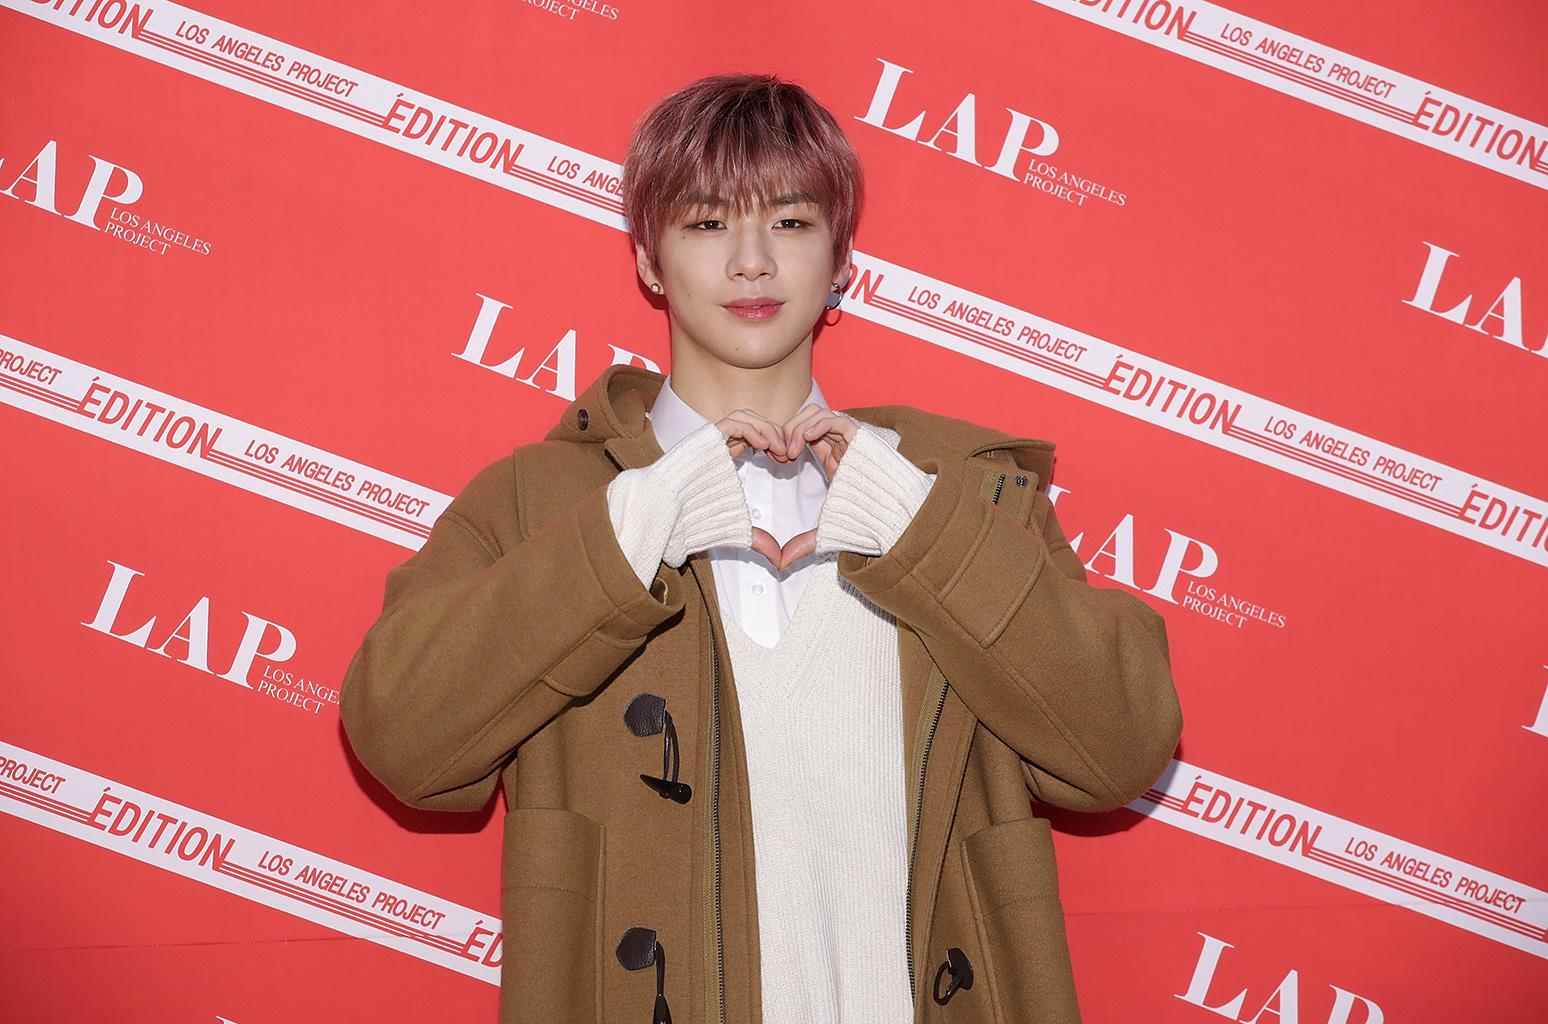 Kang Daniel Makes Solo Billboard Chart Debut on Social 50 After TWICE Jihyo Dating News & Samsung Deal | SD News